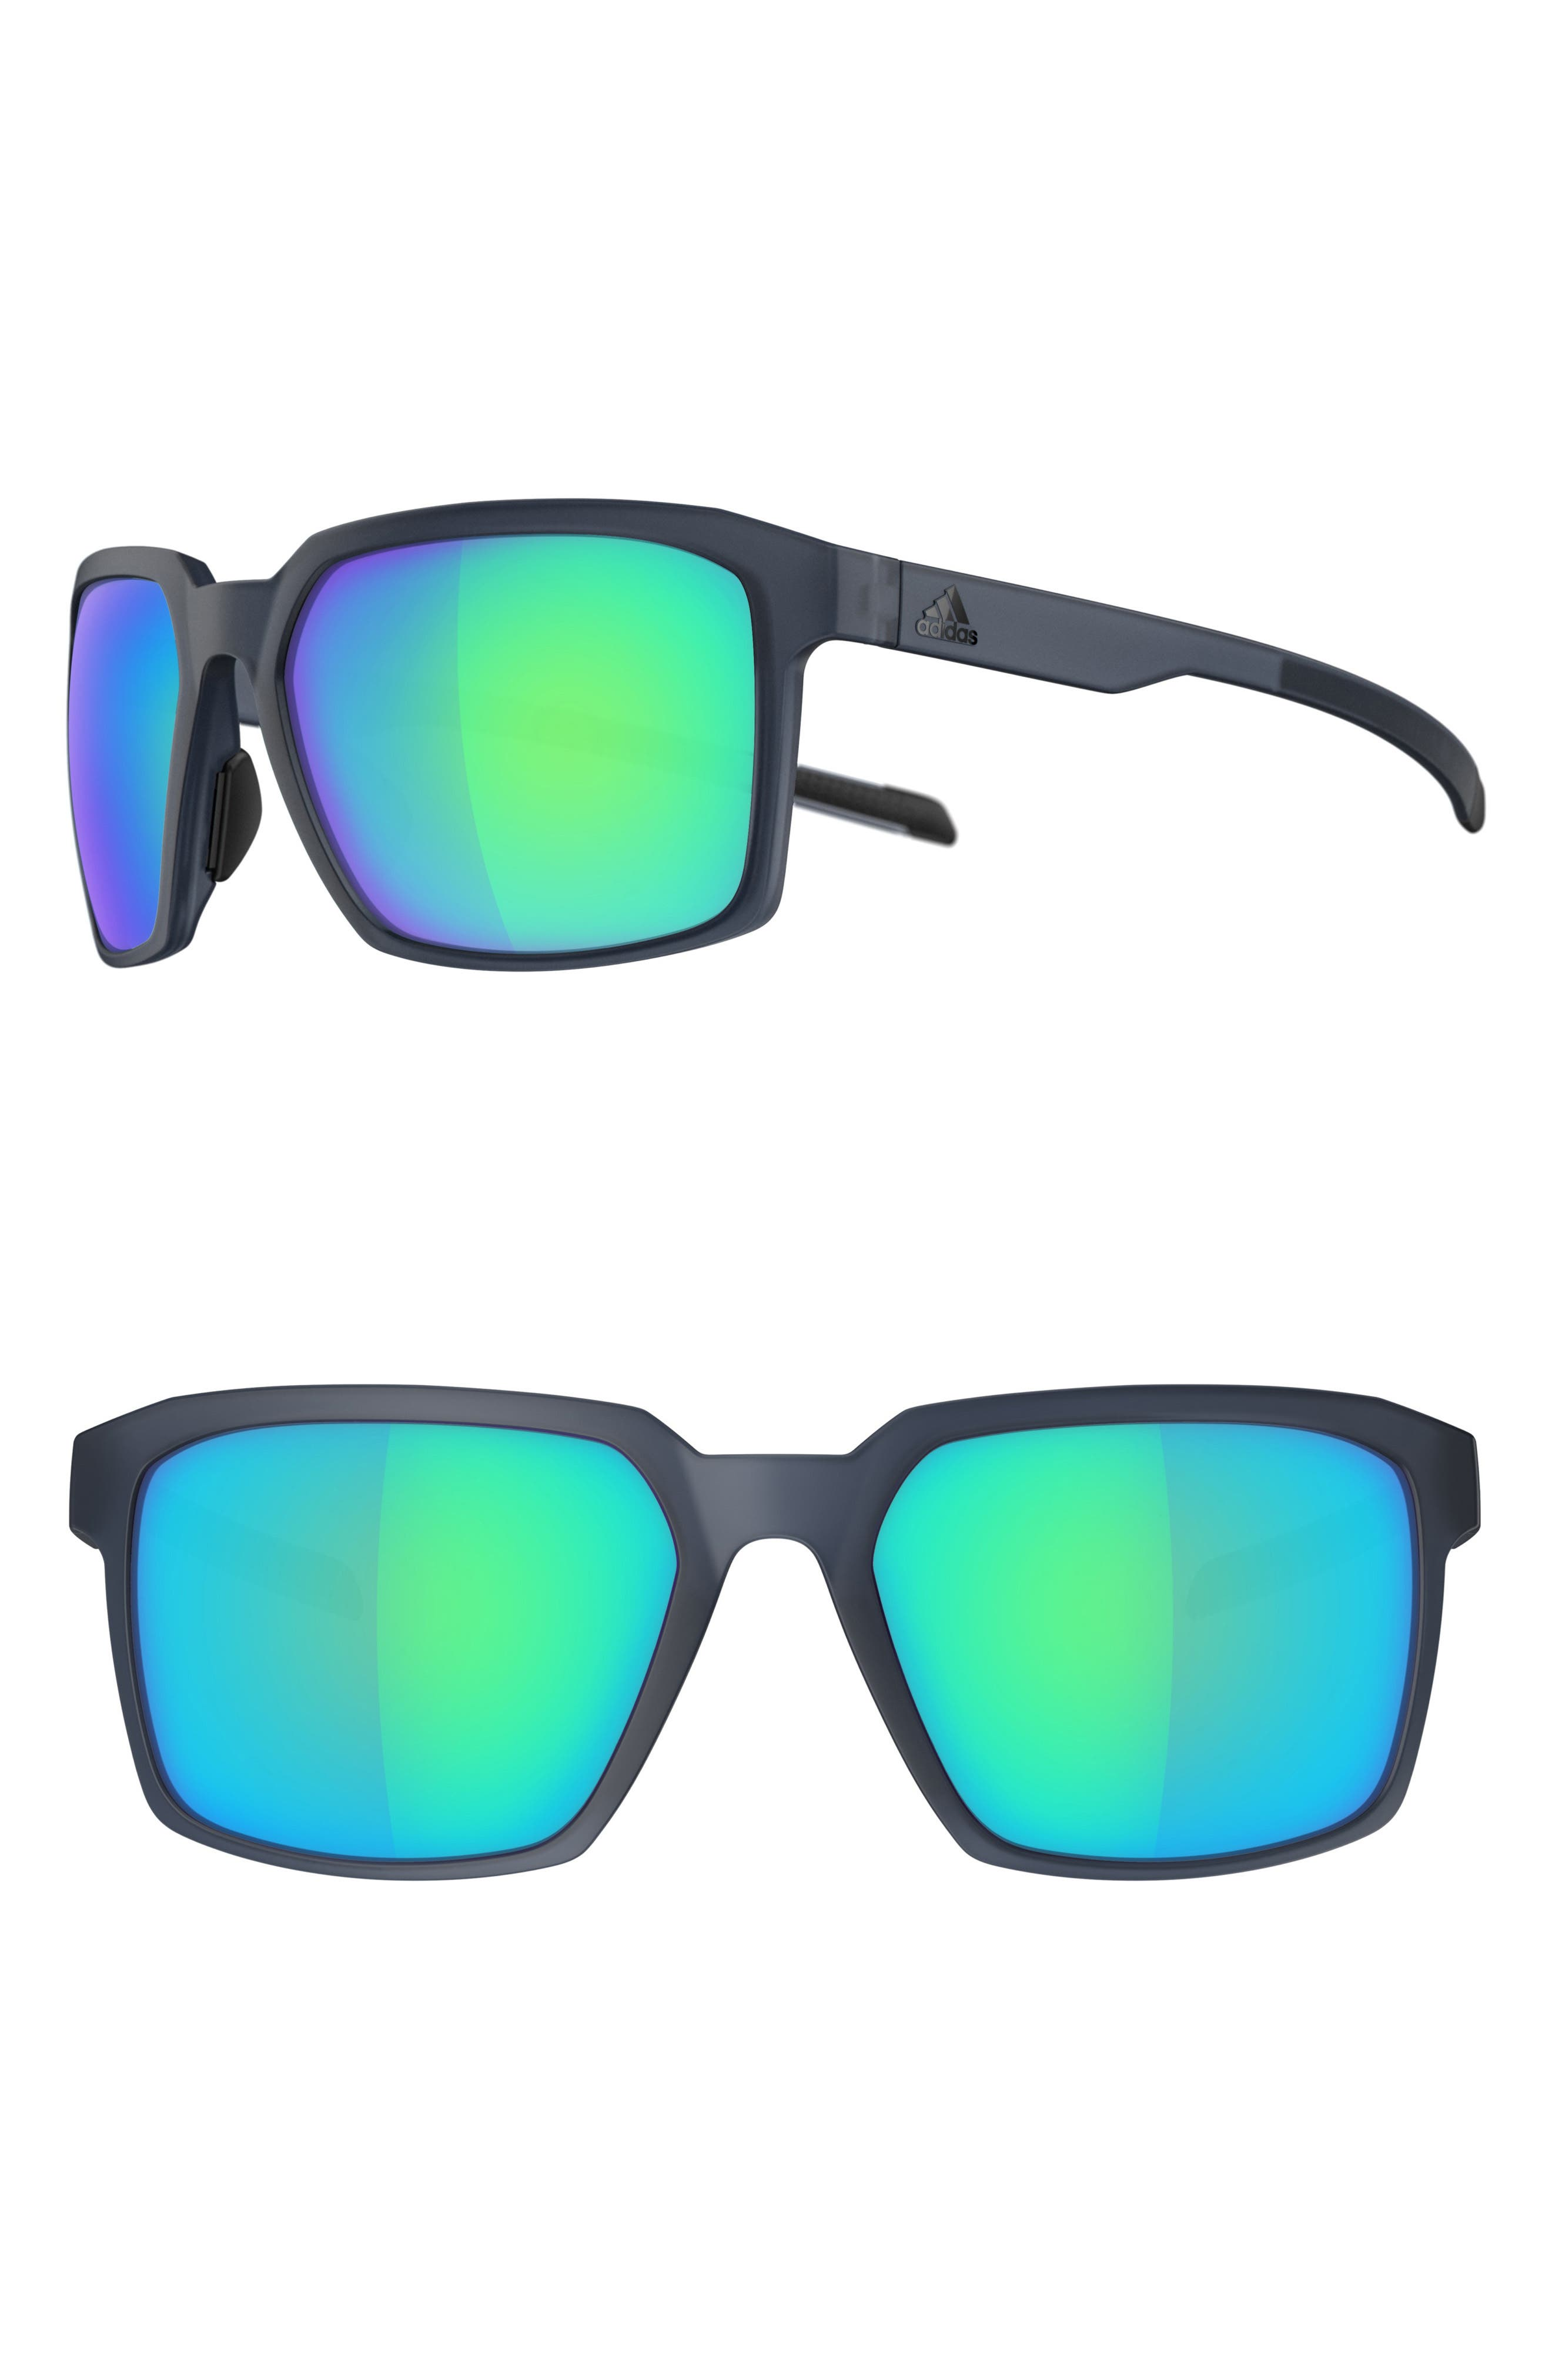 Evolver 60mm Mirrored Sunglasses,                         Main,                         color, MATTE RAW STEEL/ BLUE